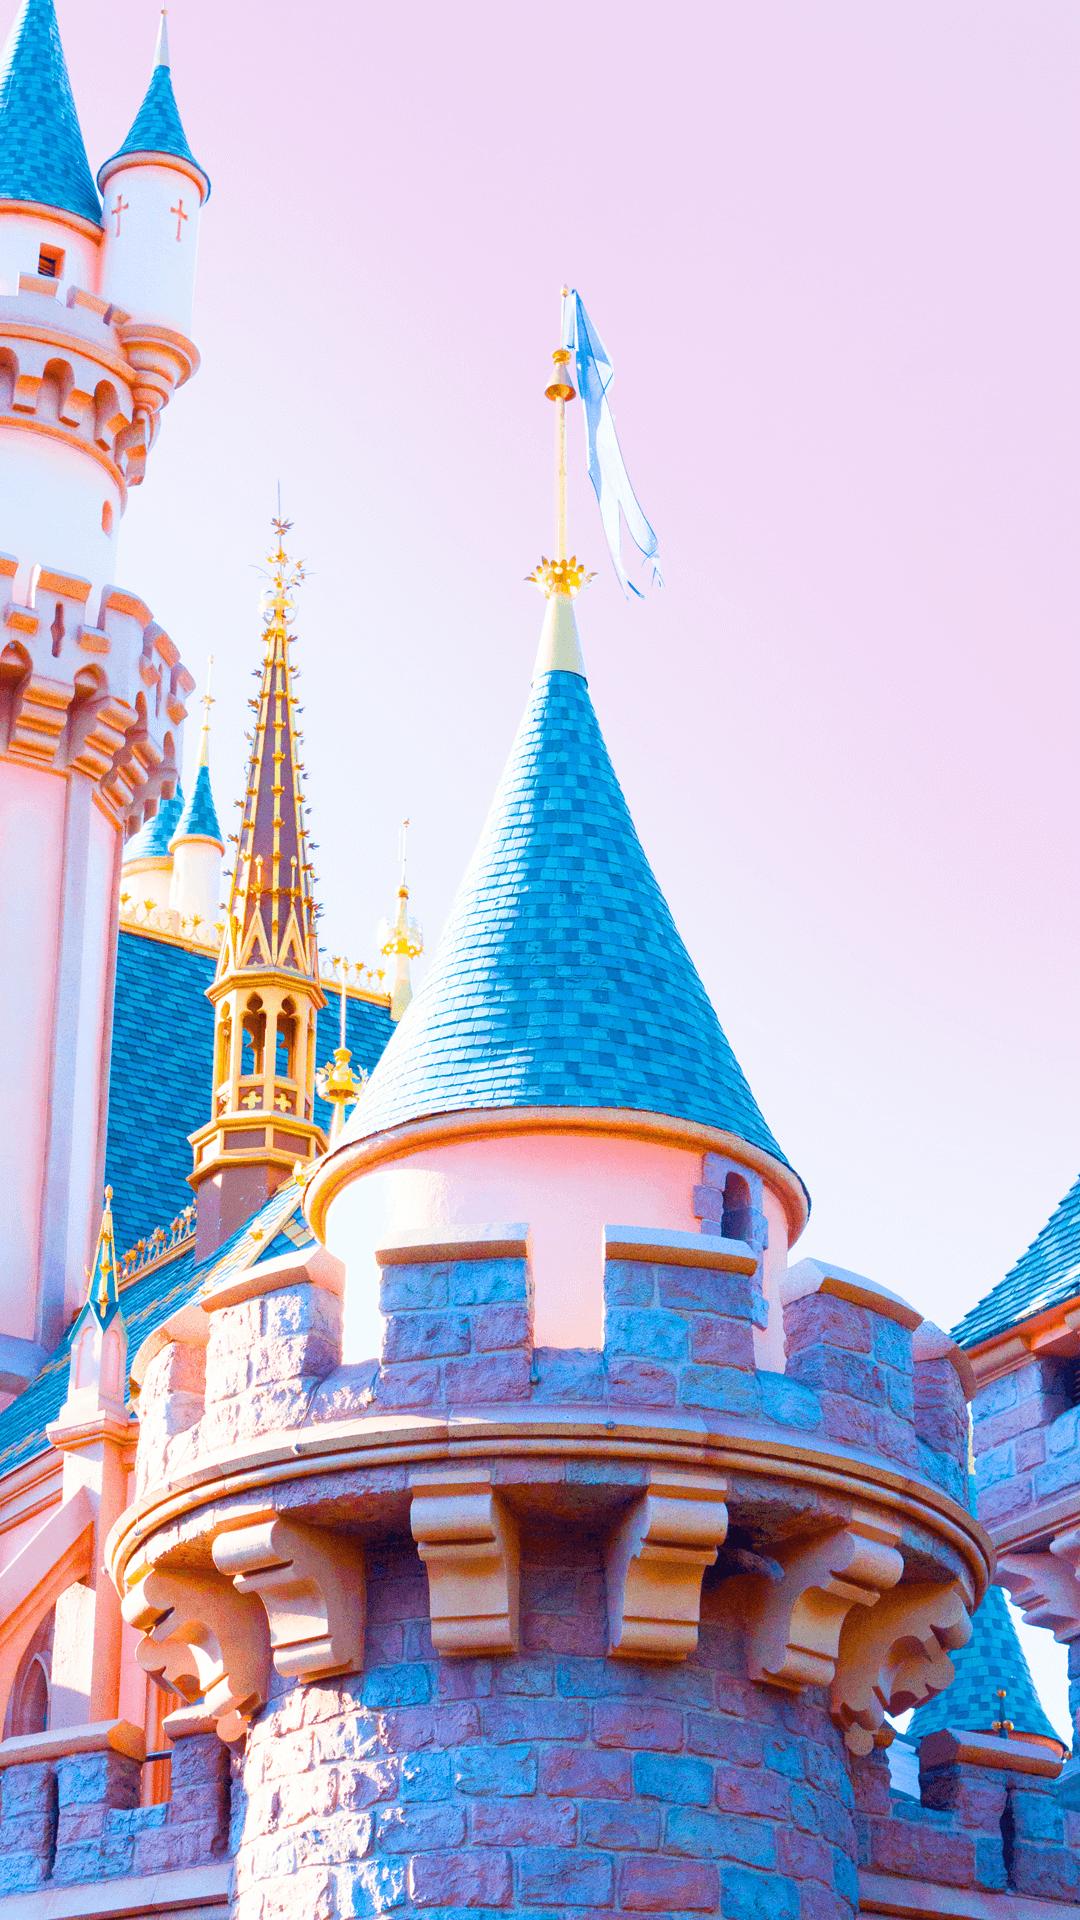 Disneyland Iphone Wallpapers Top Free Disneyland Iphone Backgrounds Wallpaperaccess